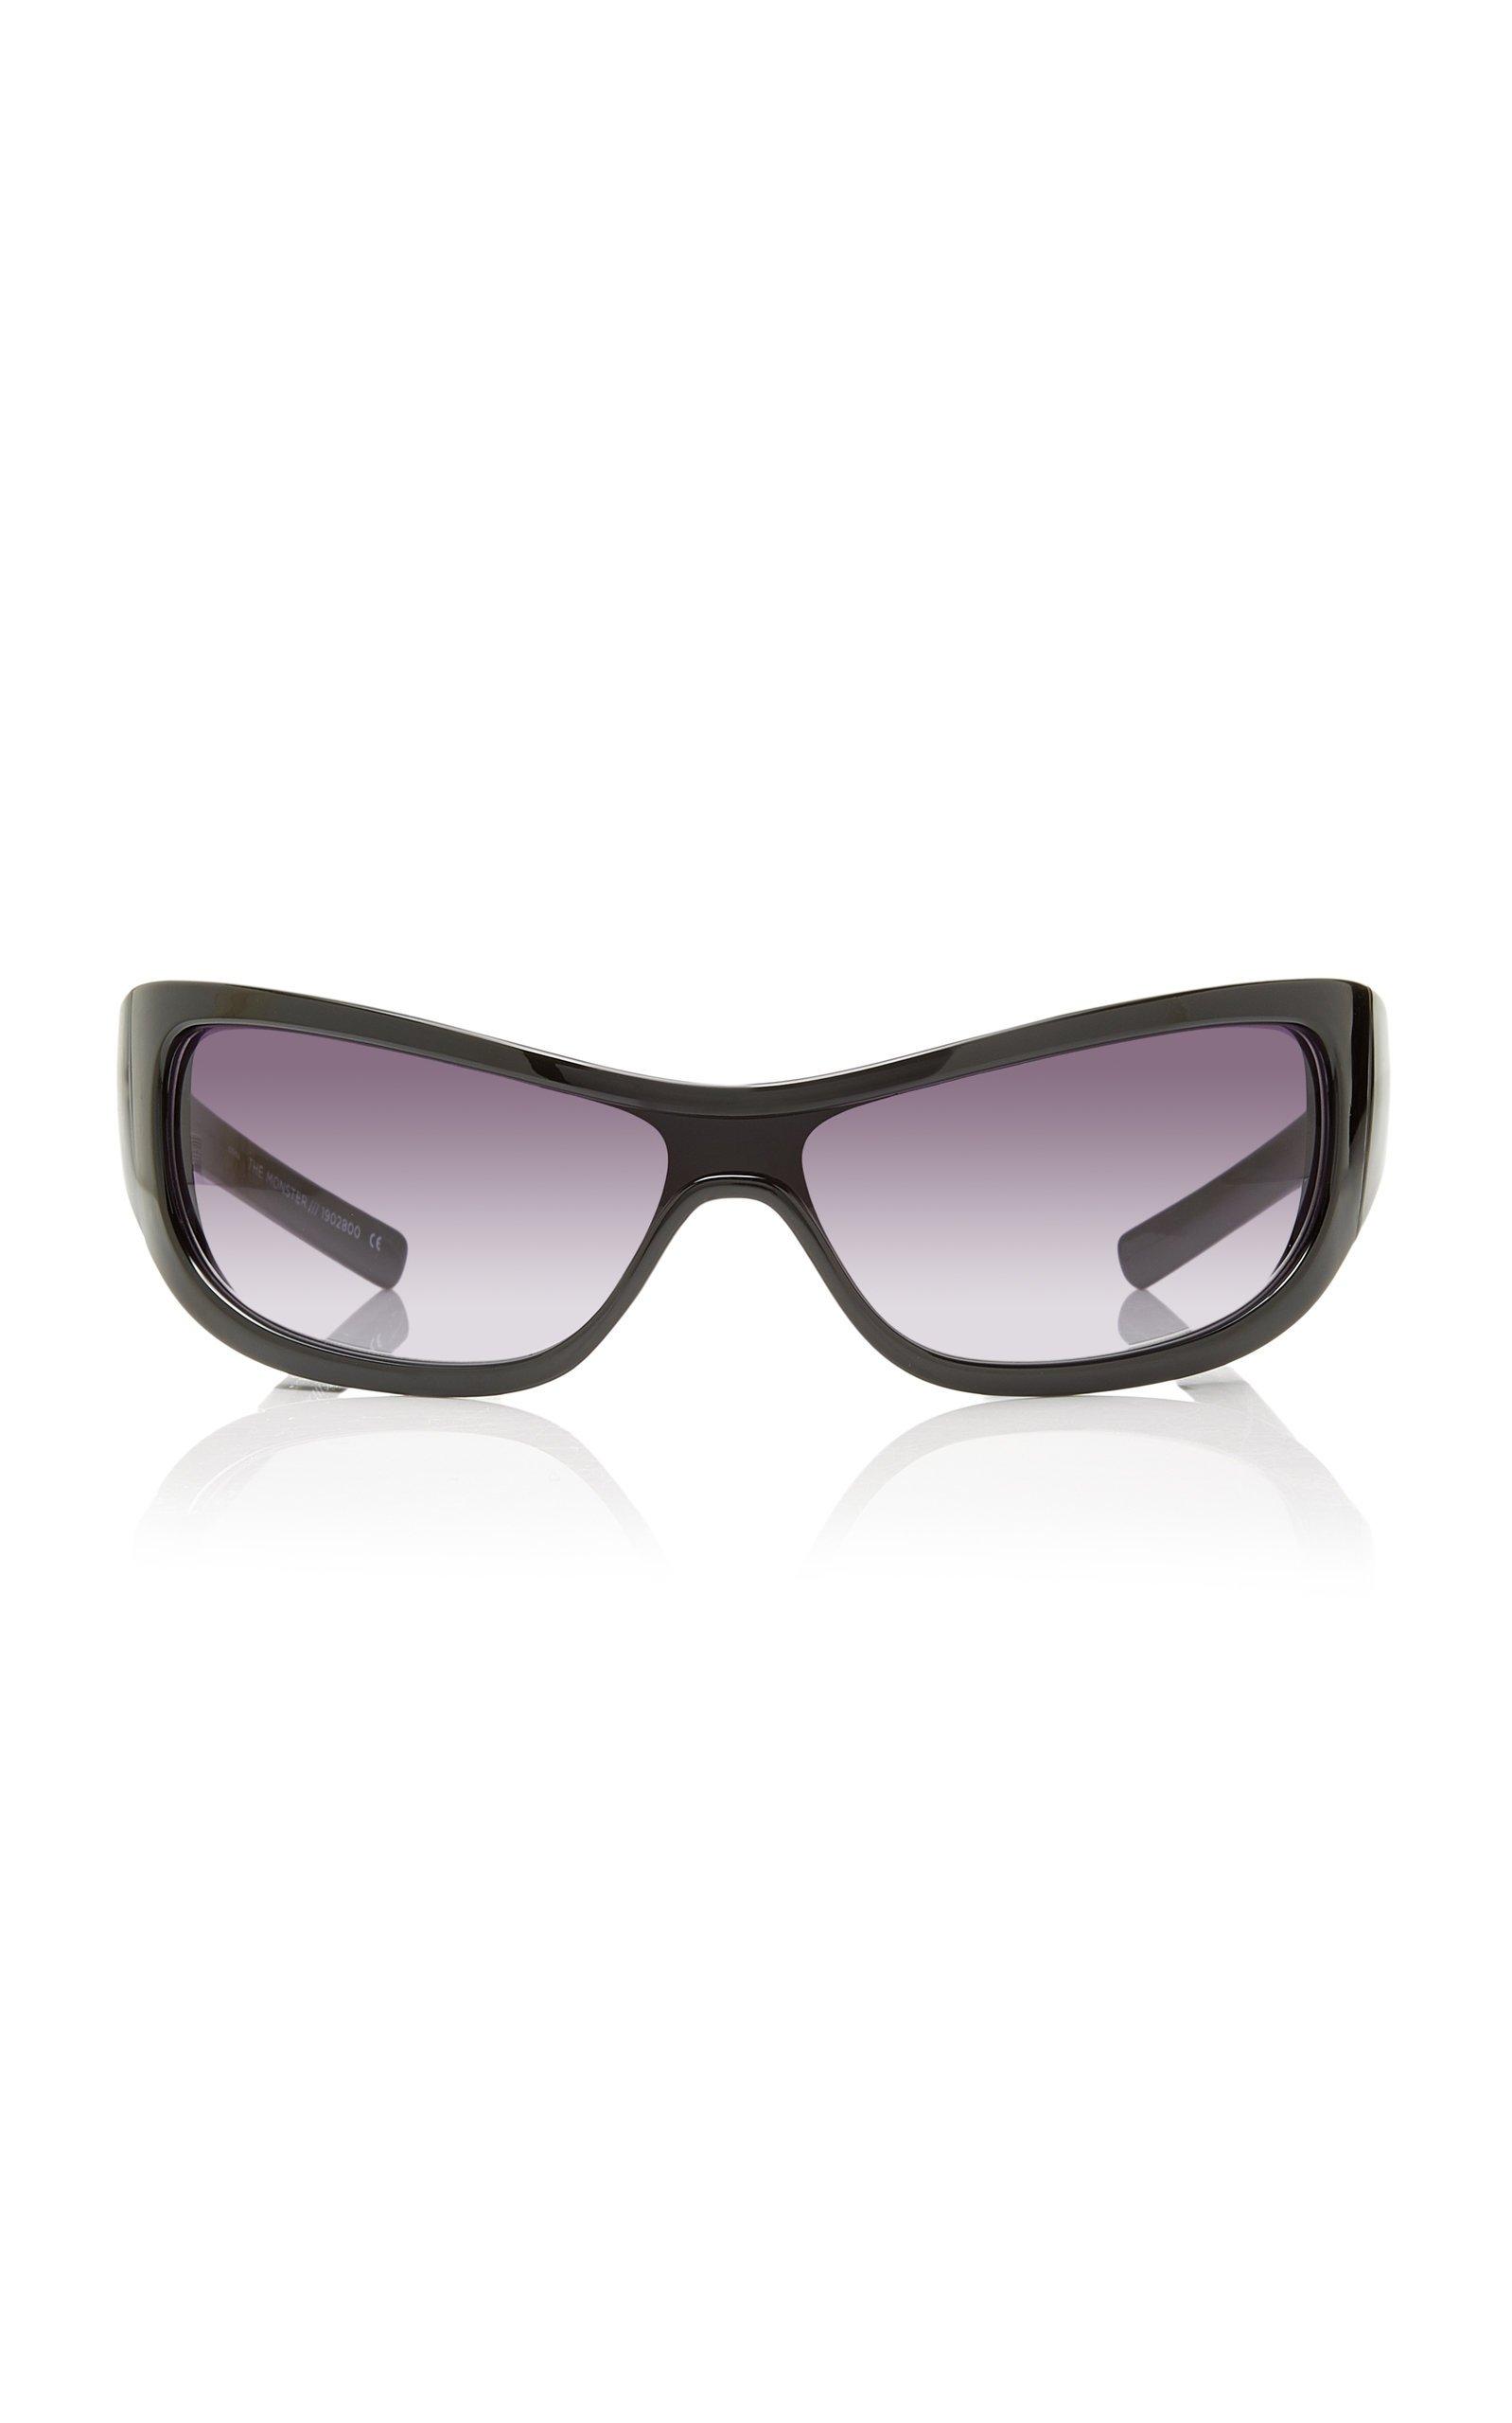 Adam Selman X Le Specs The Monster Acetate Square-Frame Sunglasses